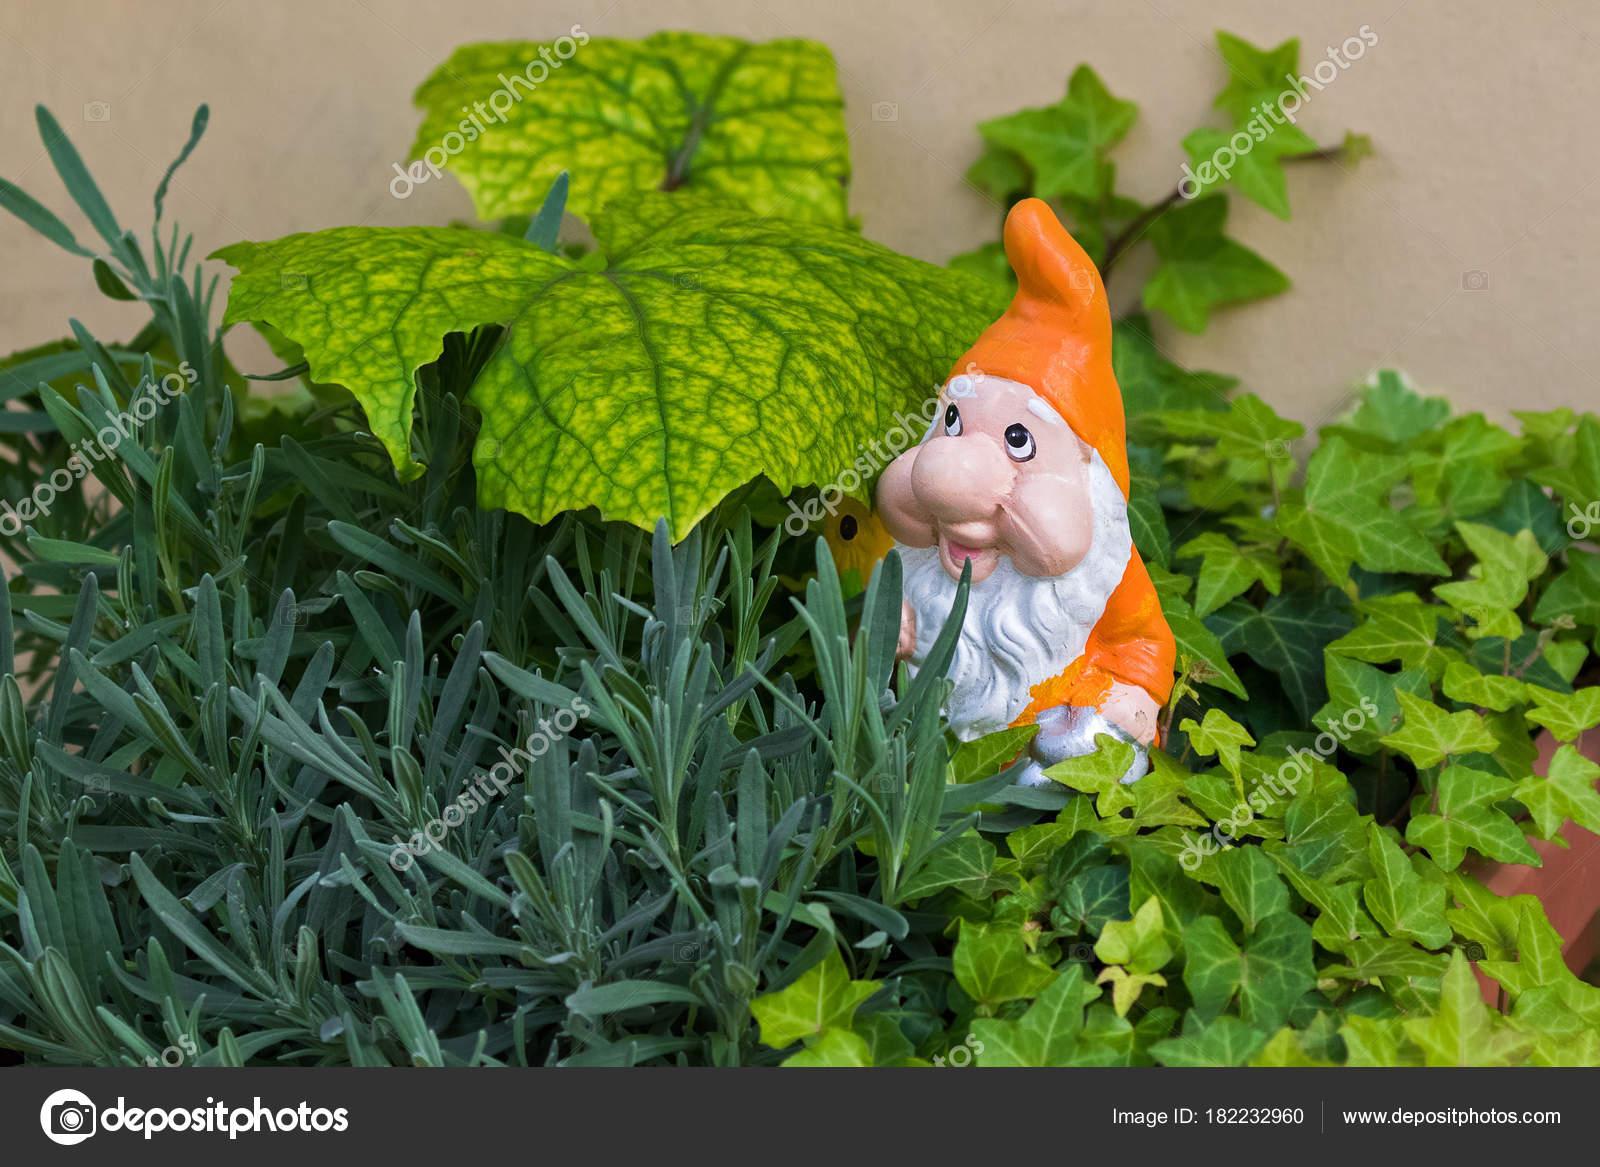 Nain nain de jardin avec un chapeau pointu de barbe blanche ...